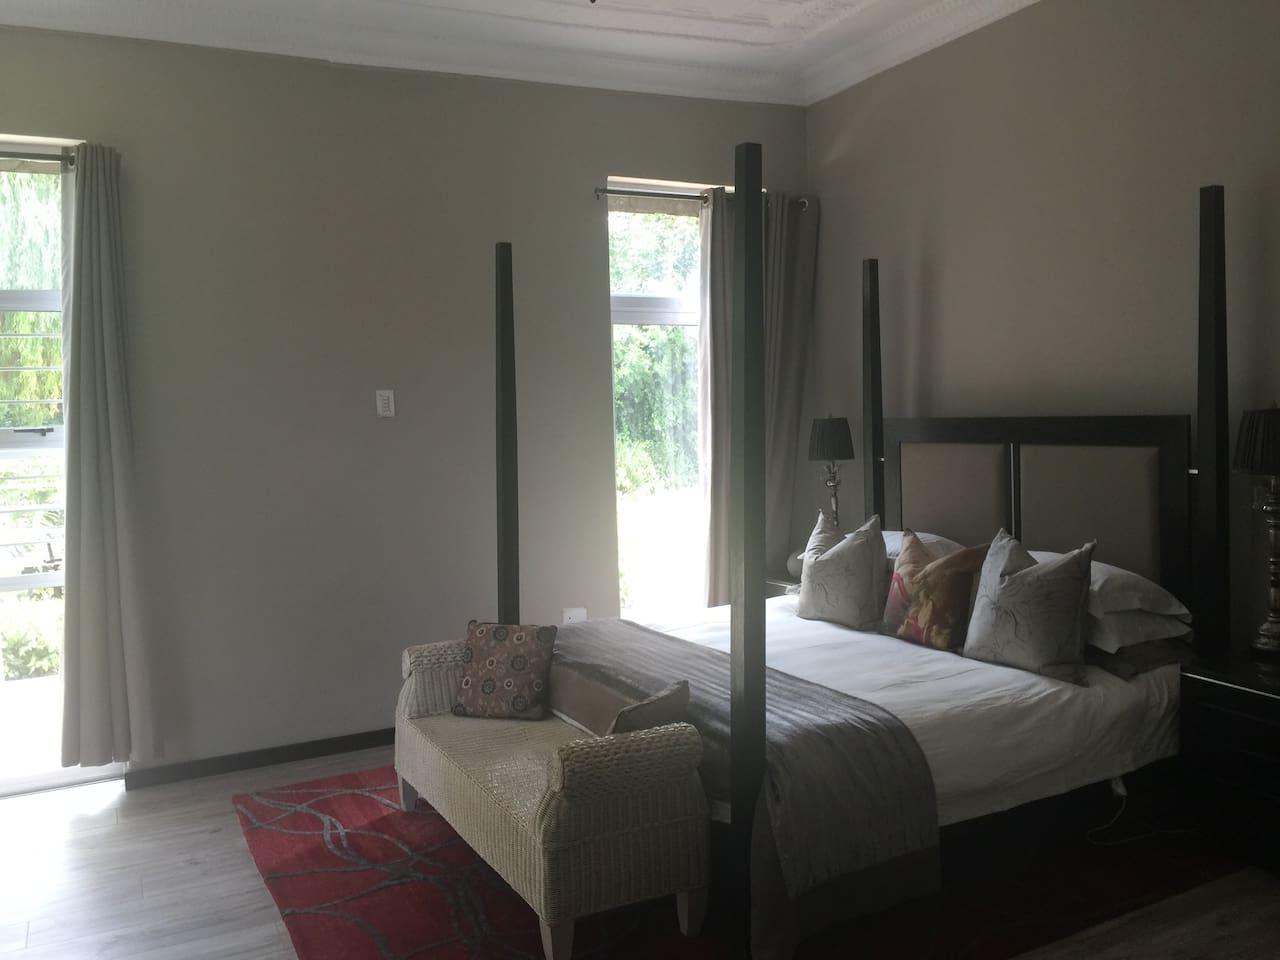 Spacious bedroom with bathroom ensuite